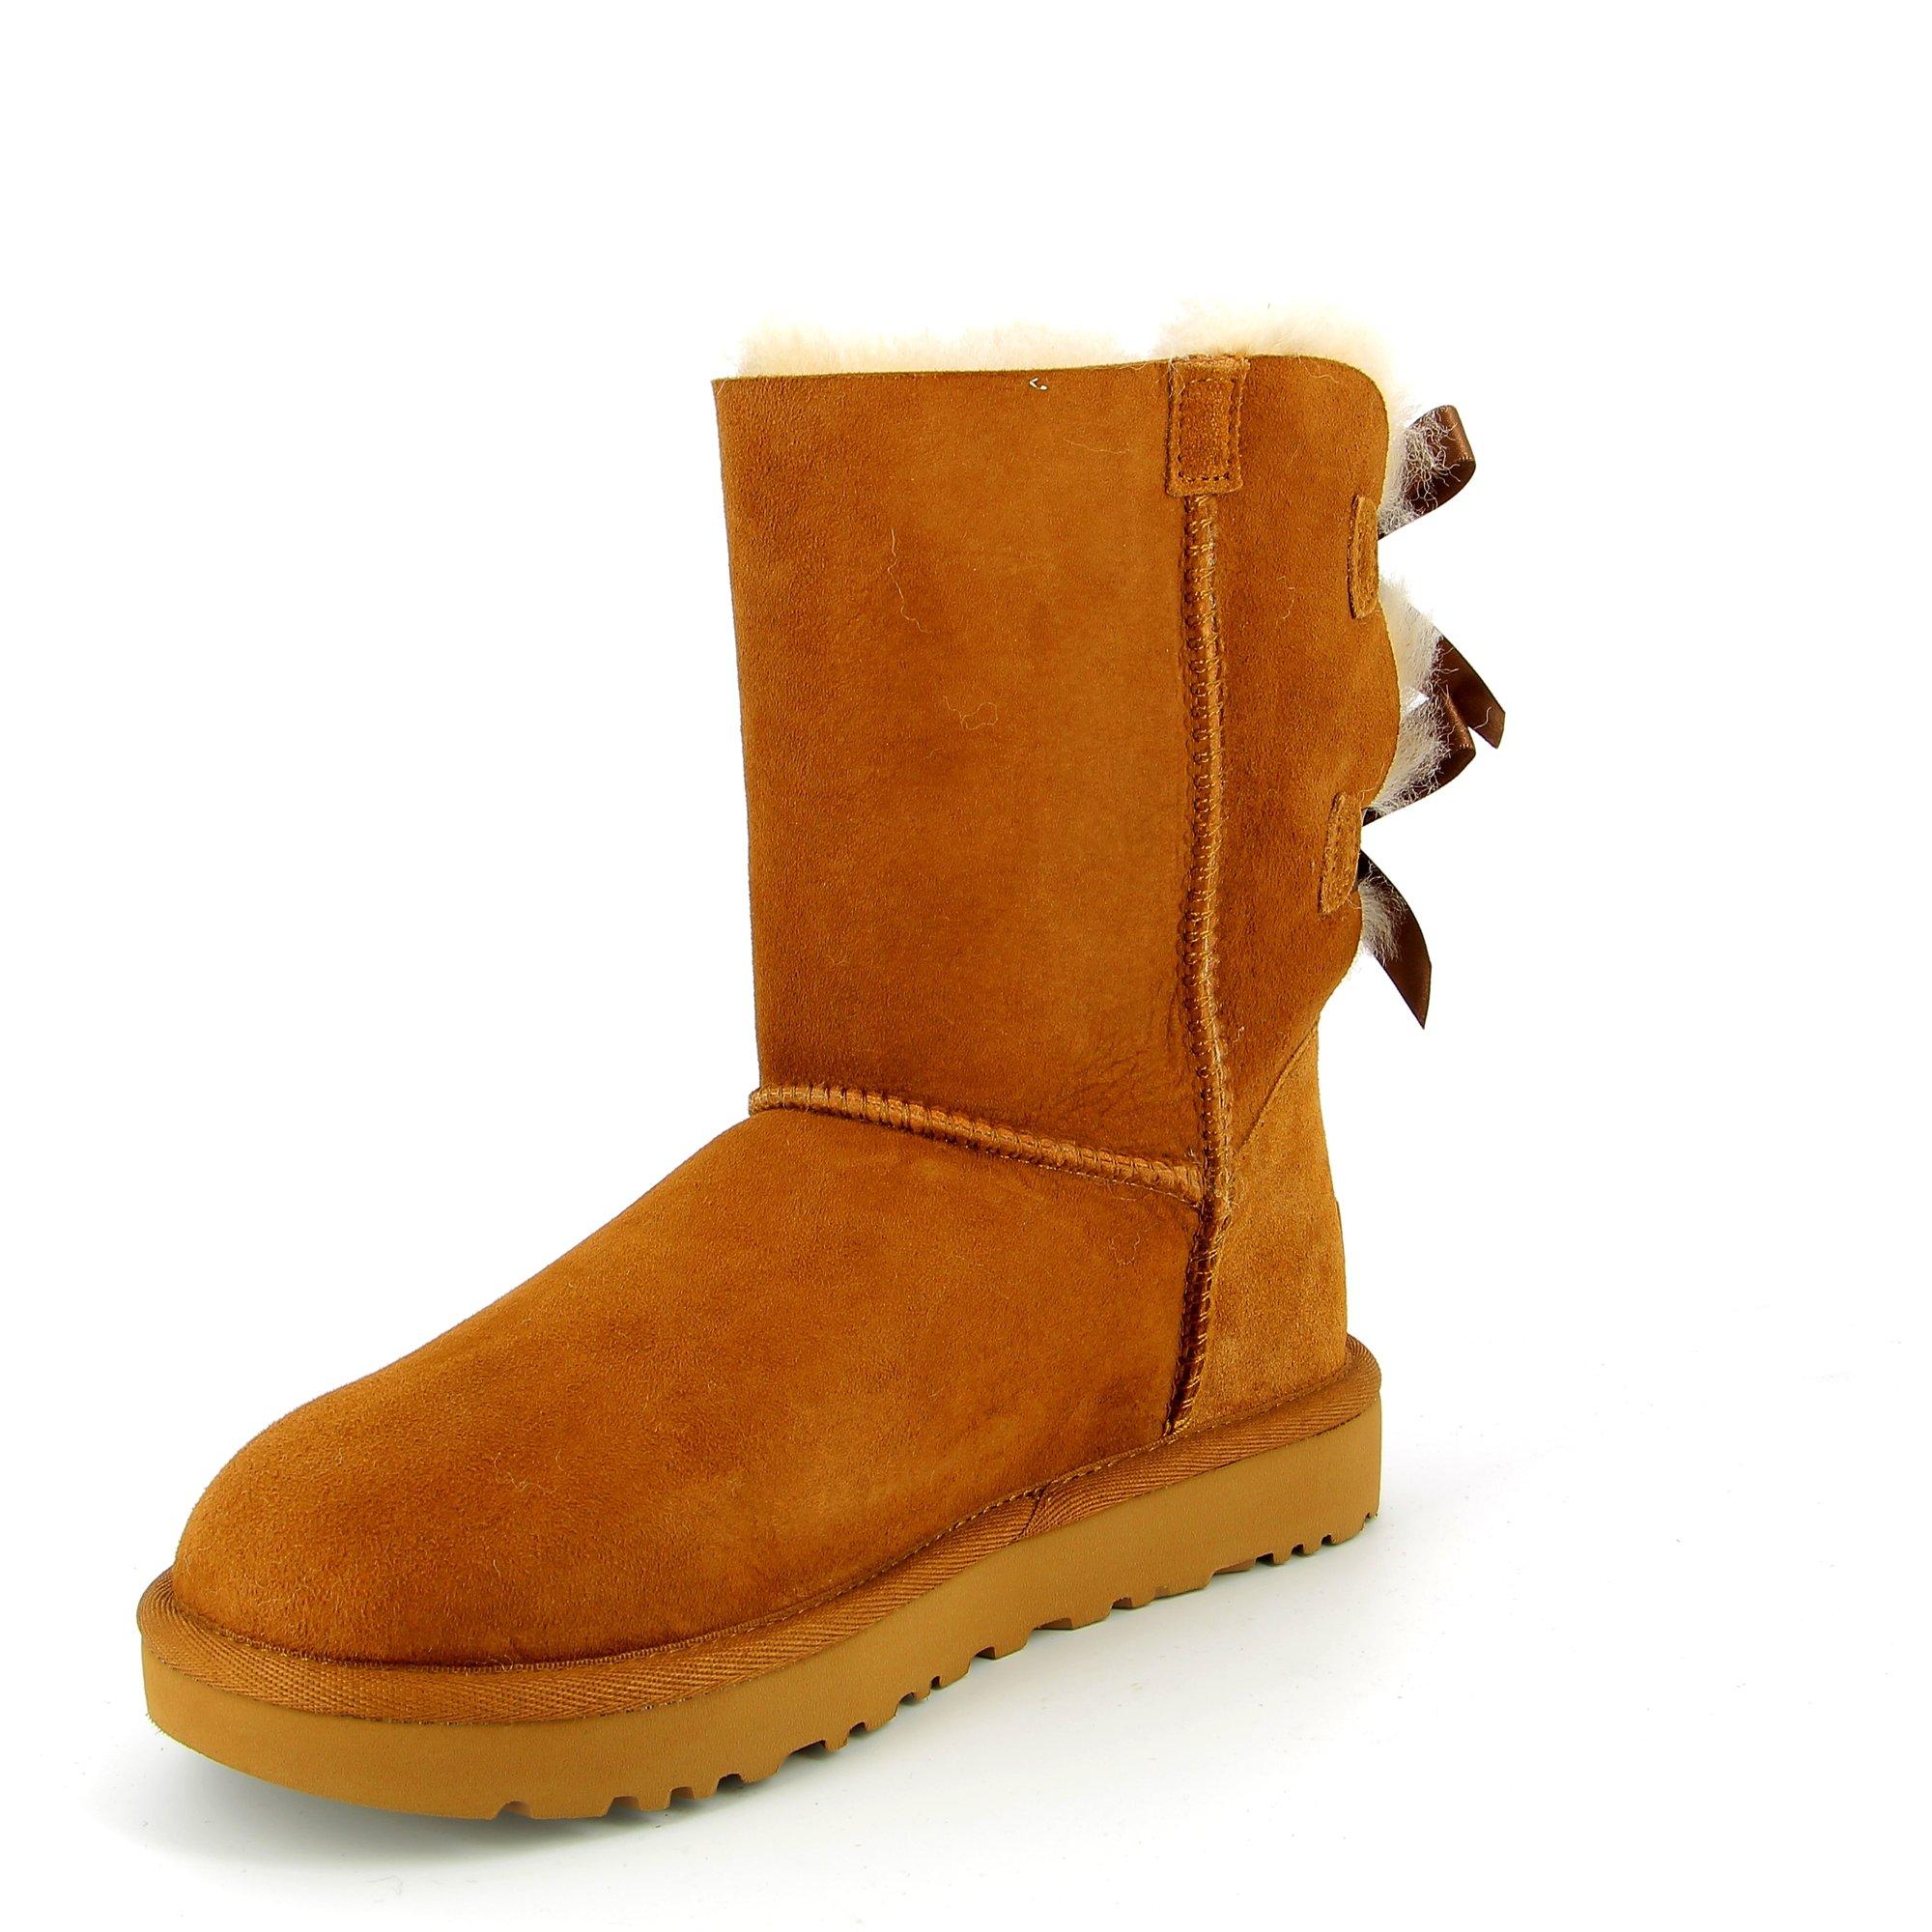 Ugg Boots chesnut